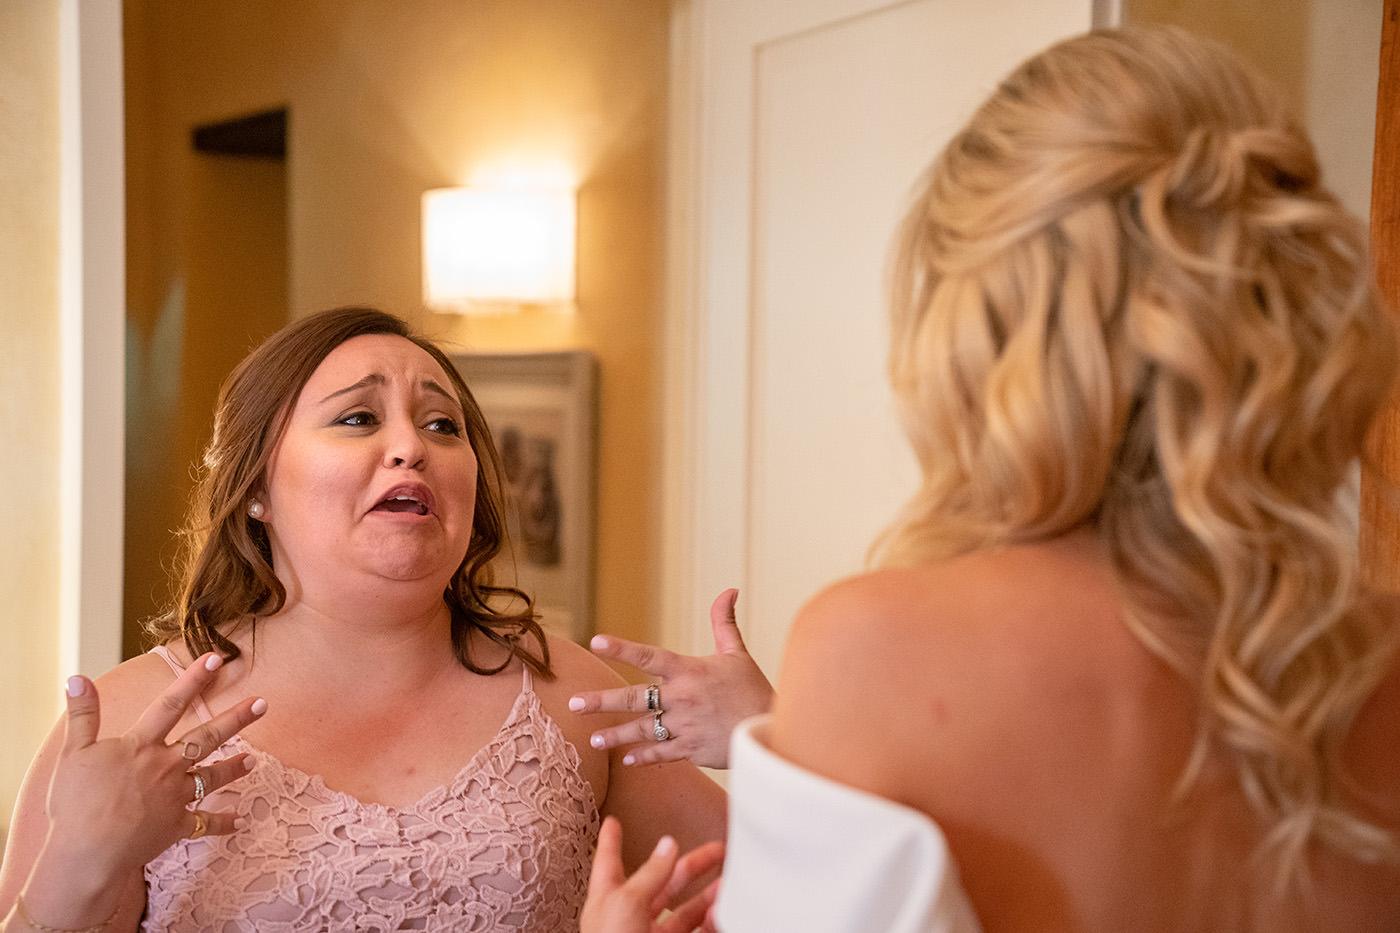 Tuscan Wedding Photo Shoots At Palagio Castle: bridesmade look at the bride